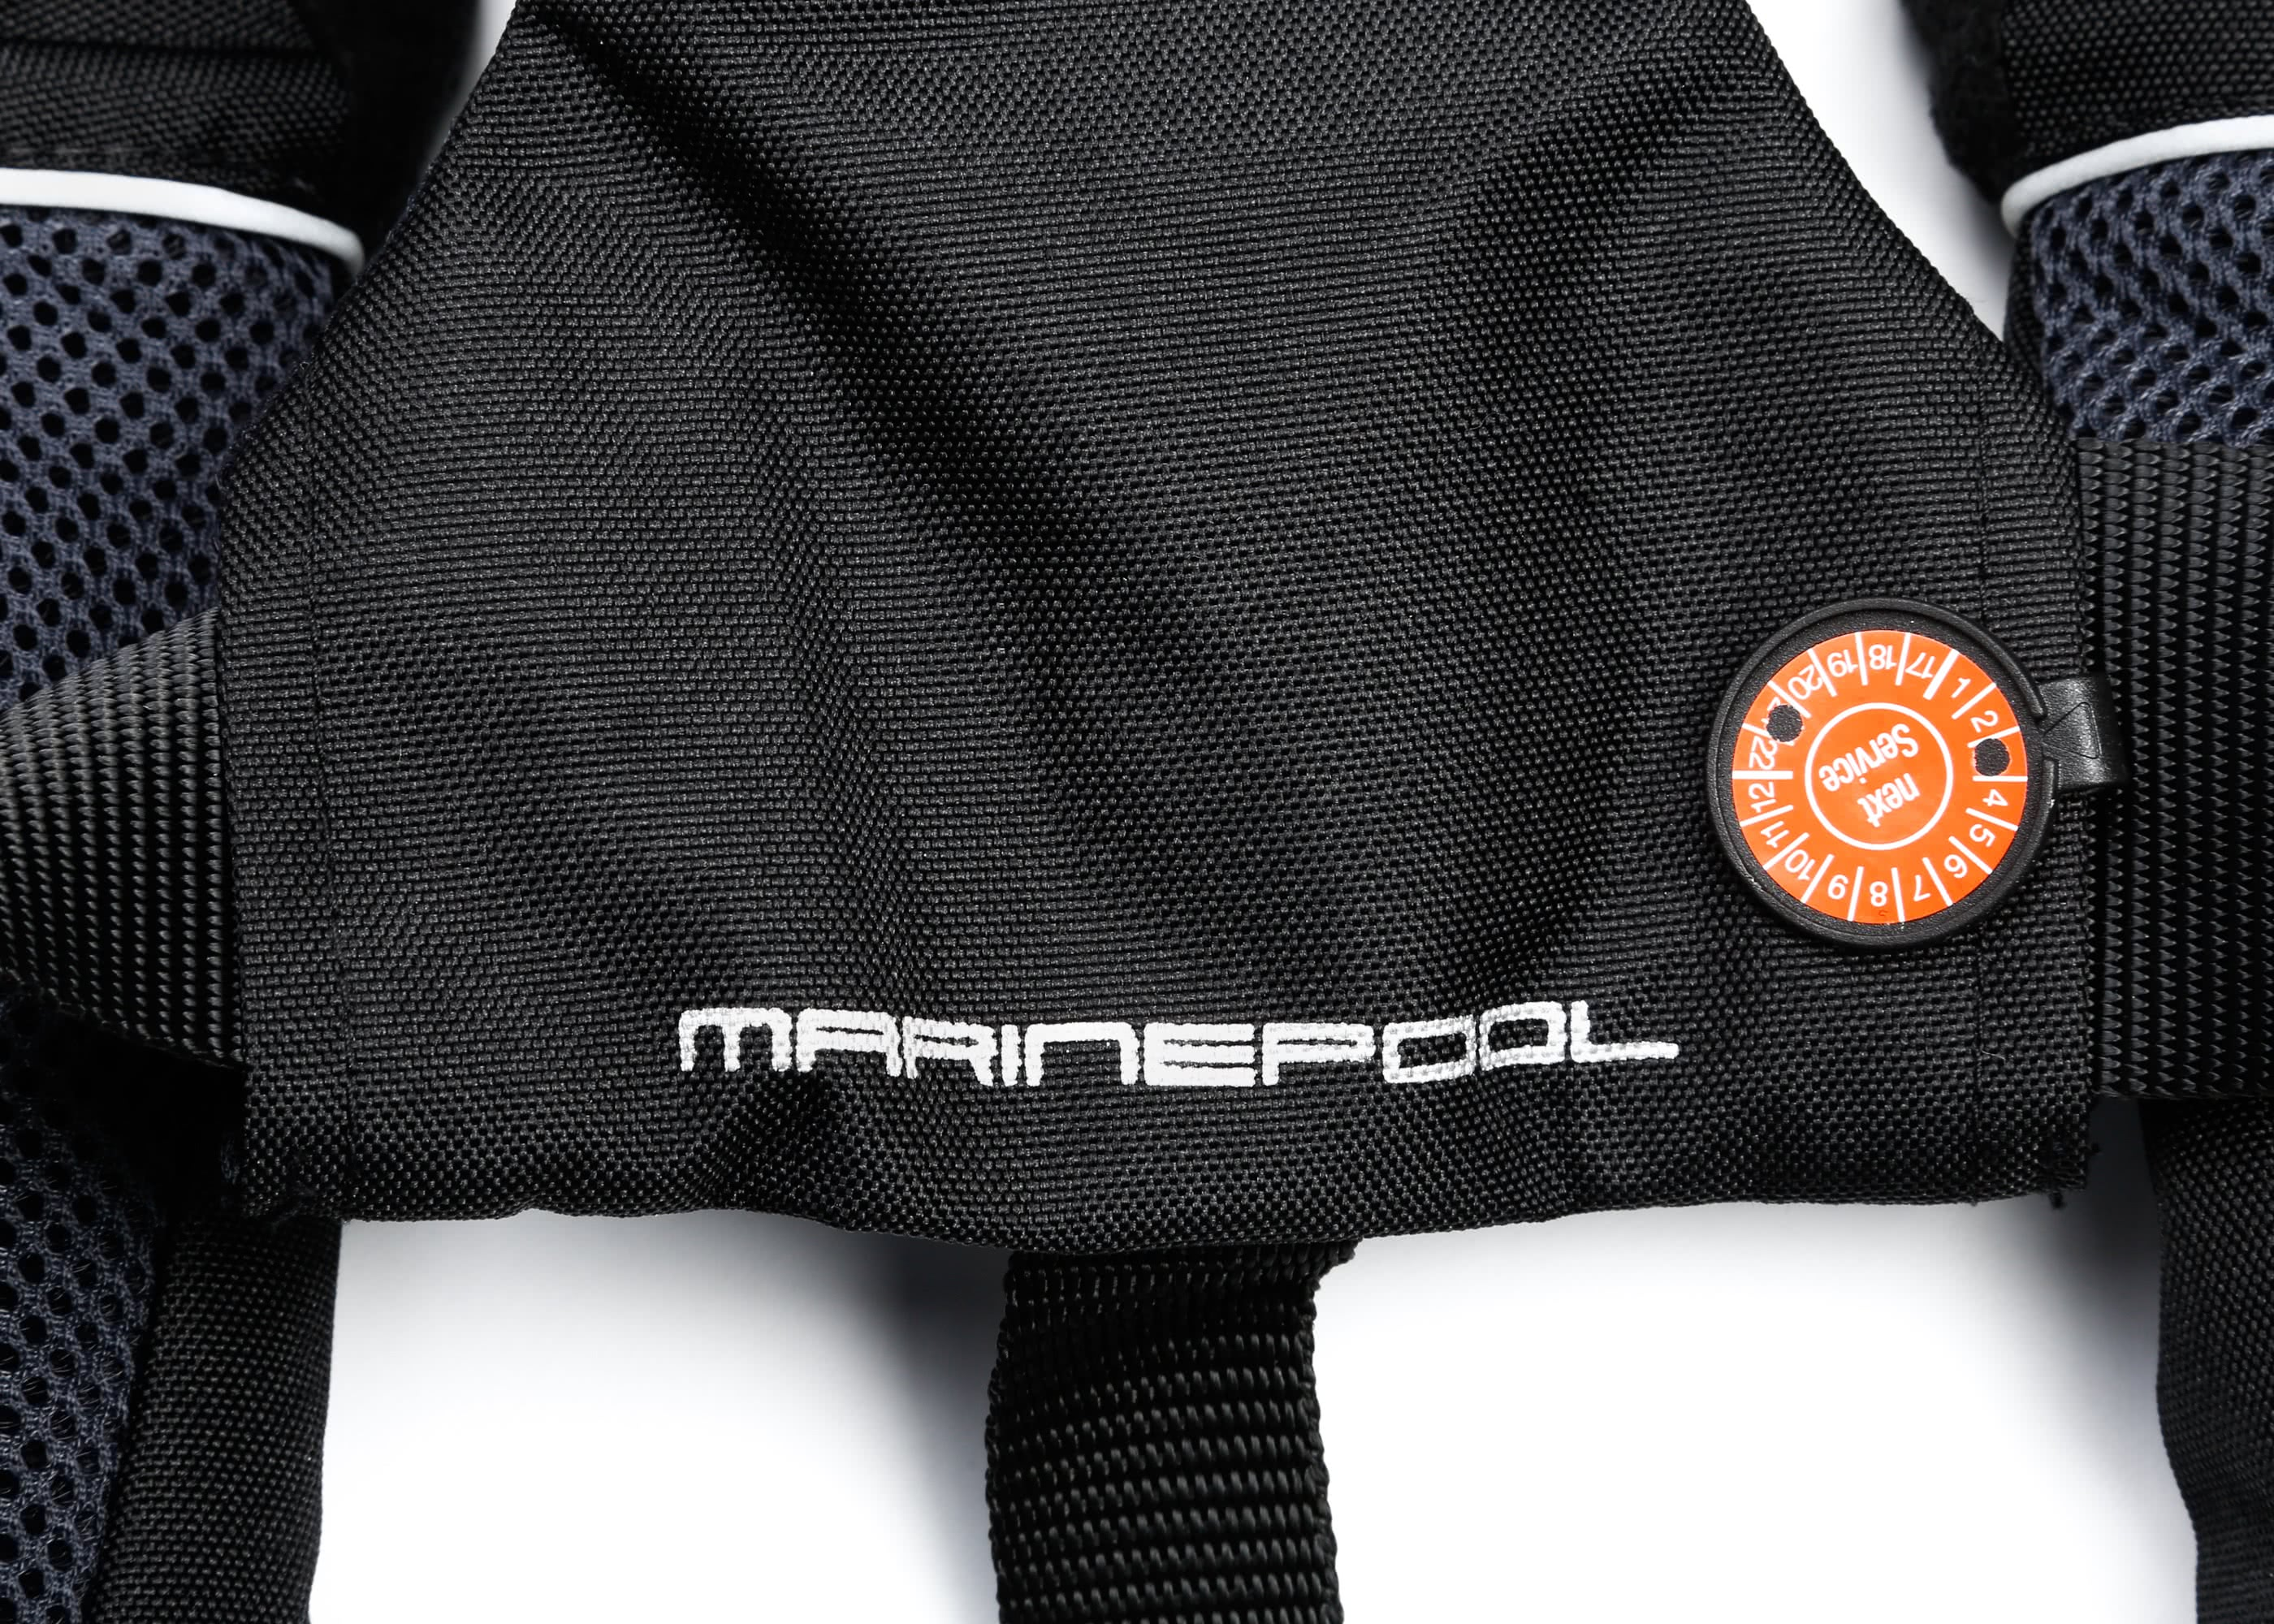 99047_Marinepool - Rettungsweste_ISO220_-6.JPG